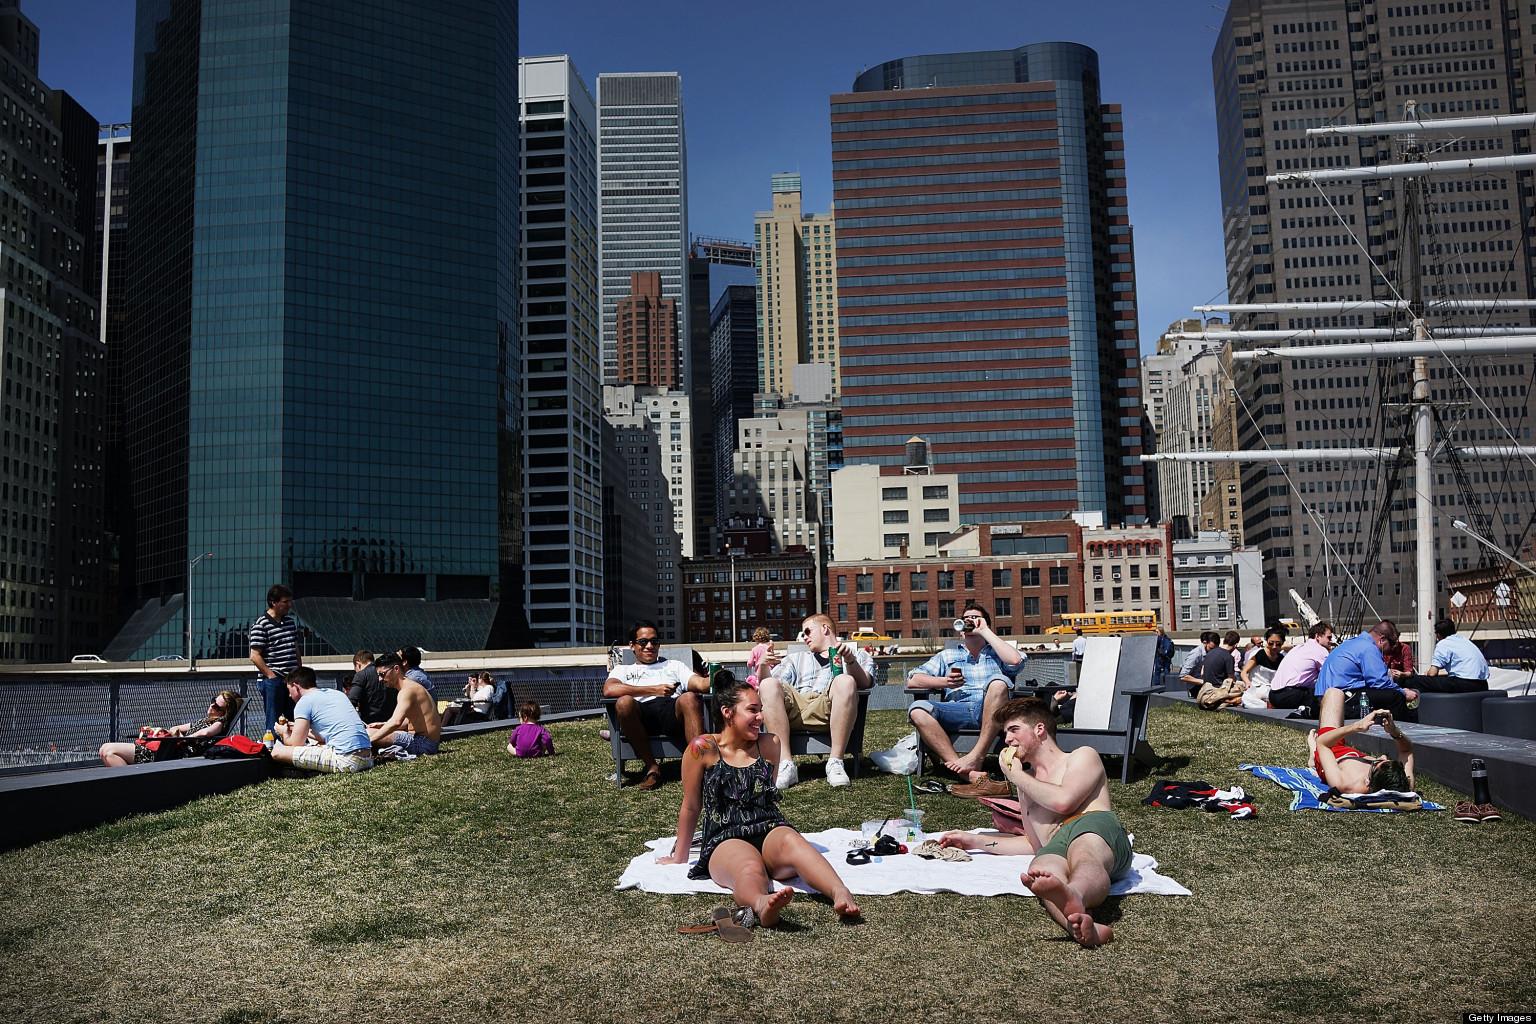 New york city weather next week